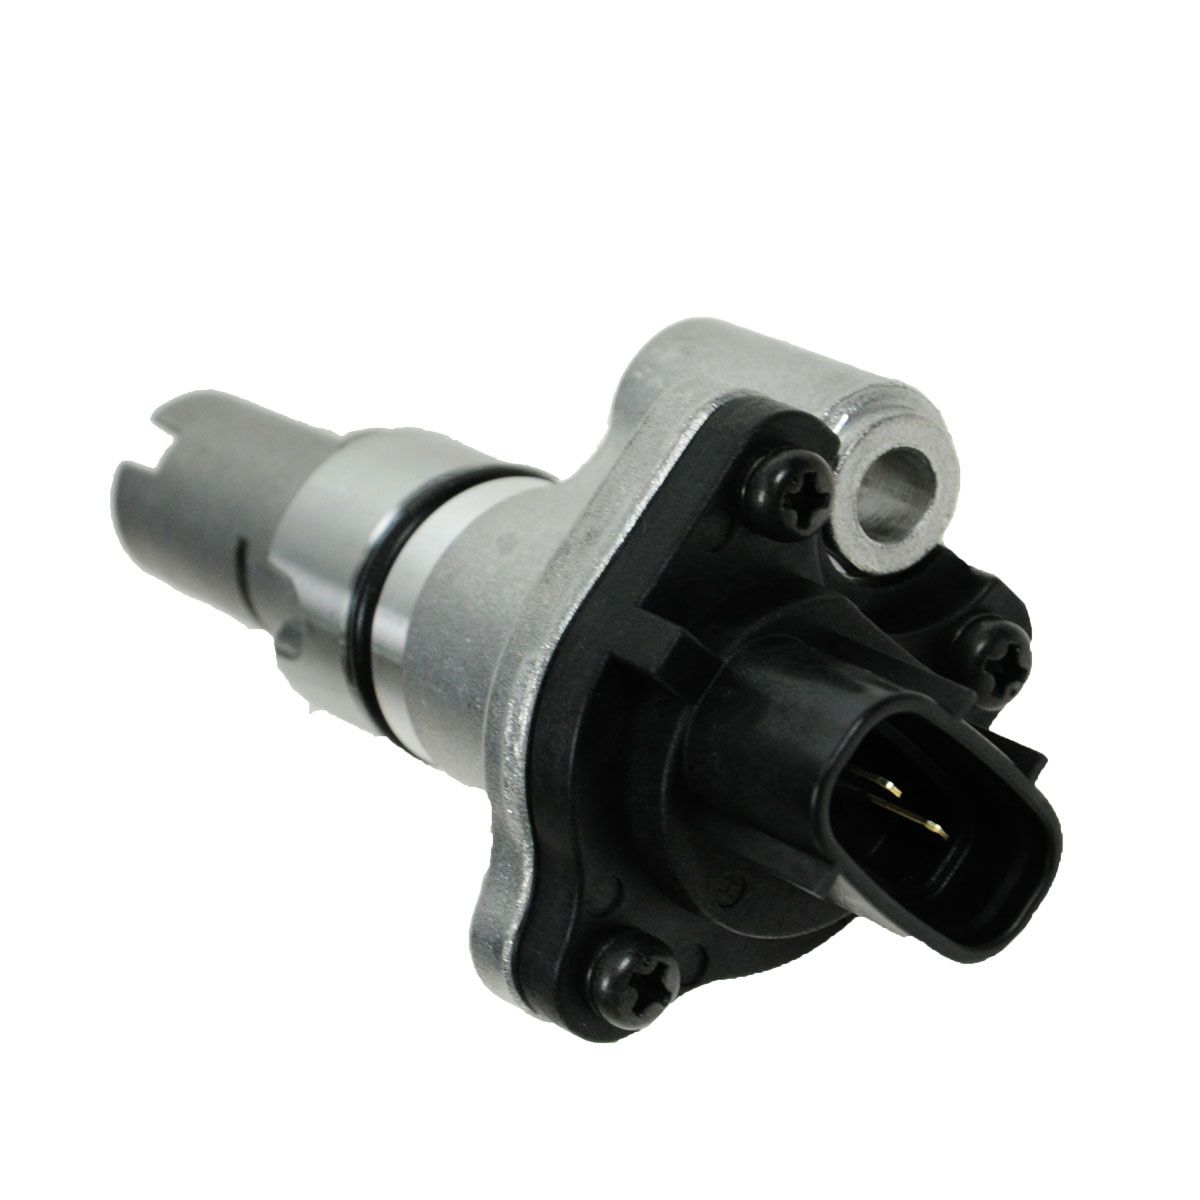 1992 Toyota Camry Transmission: Vehicle Speed Sensor For 92-04 Toyota Camry Solara 2.2L MT